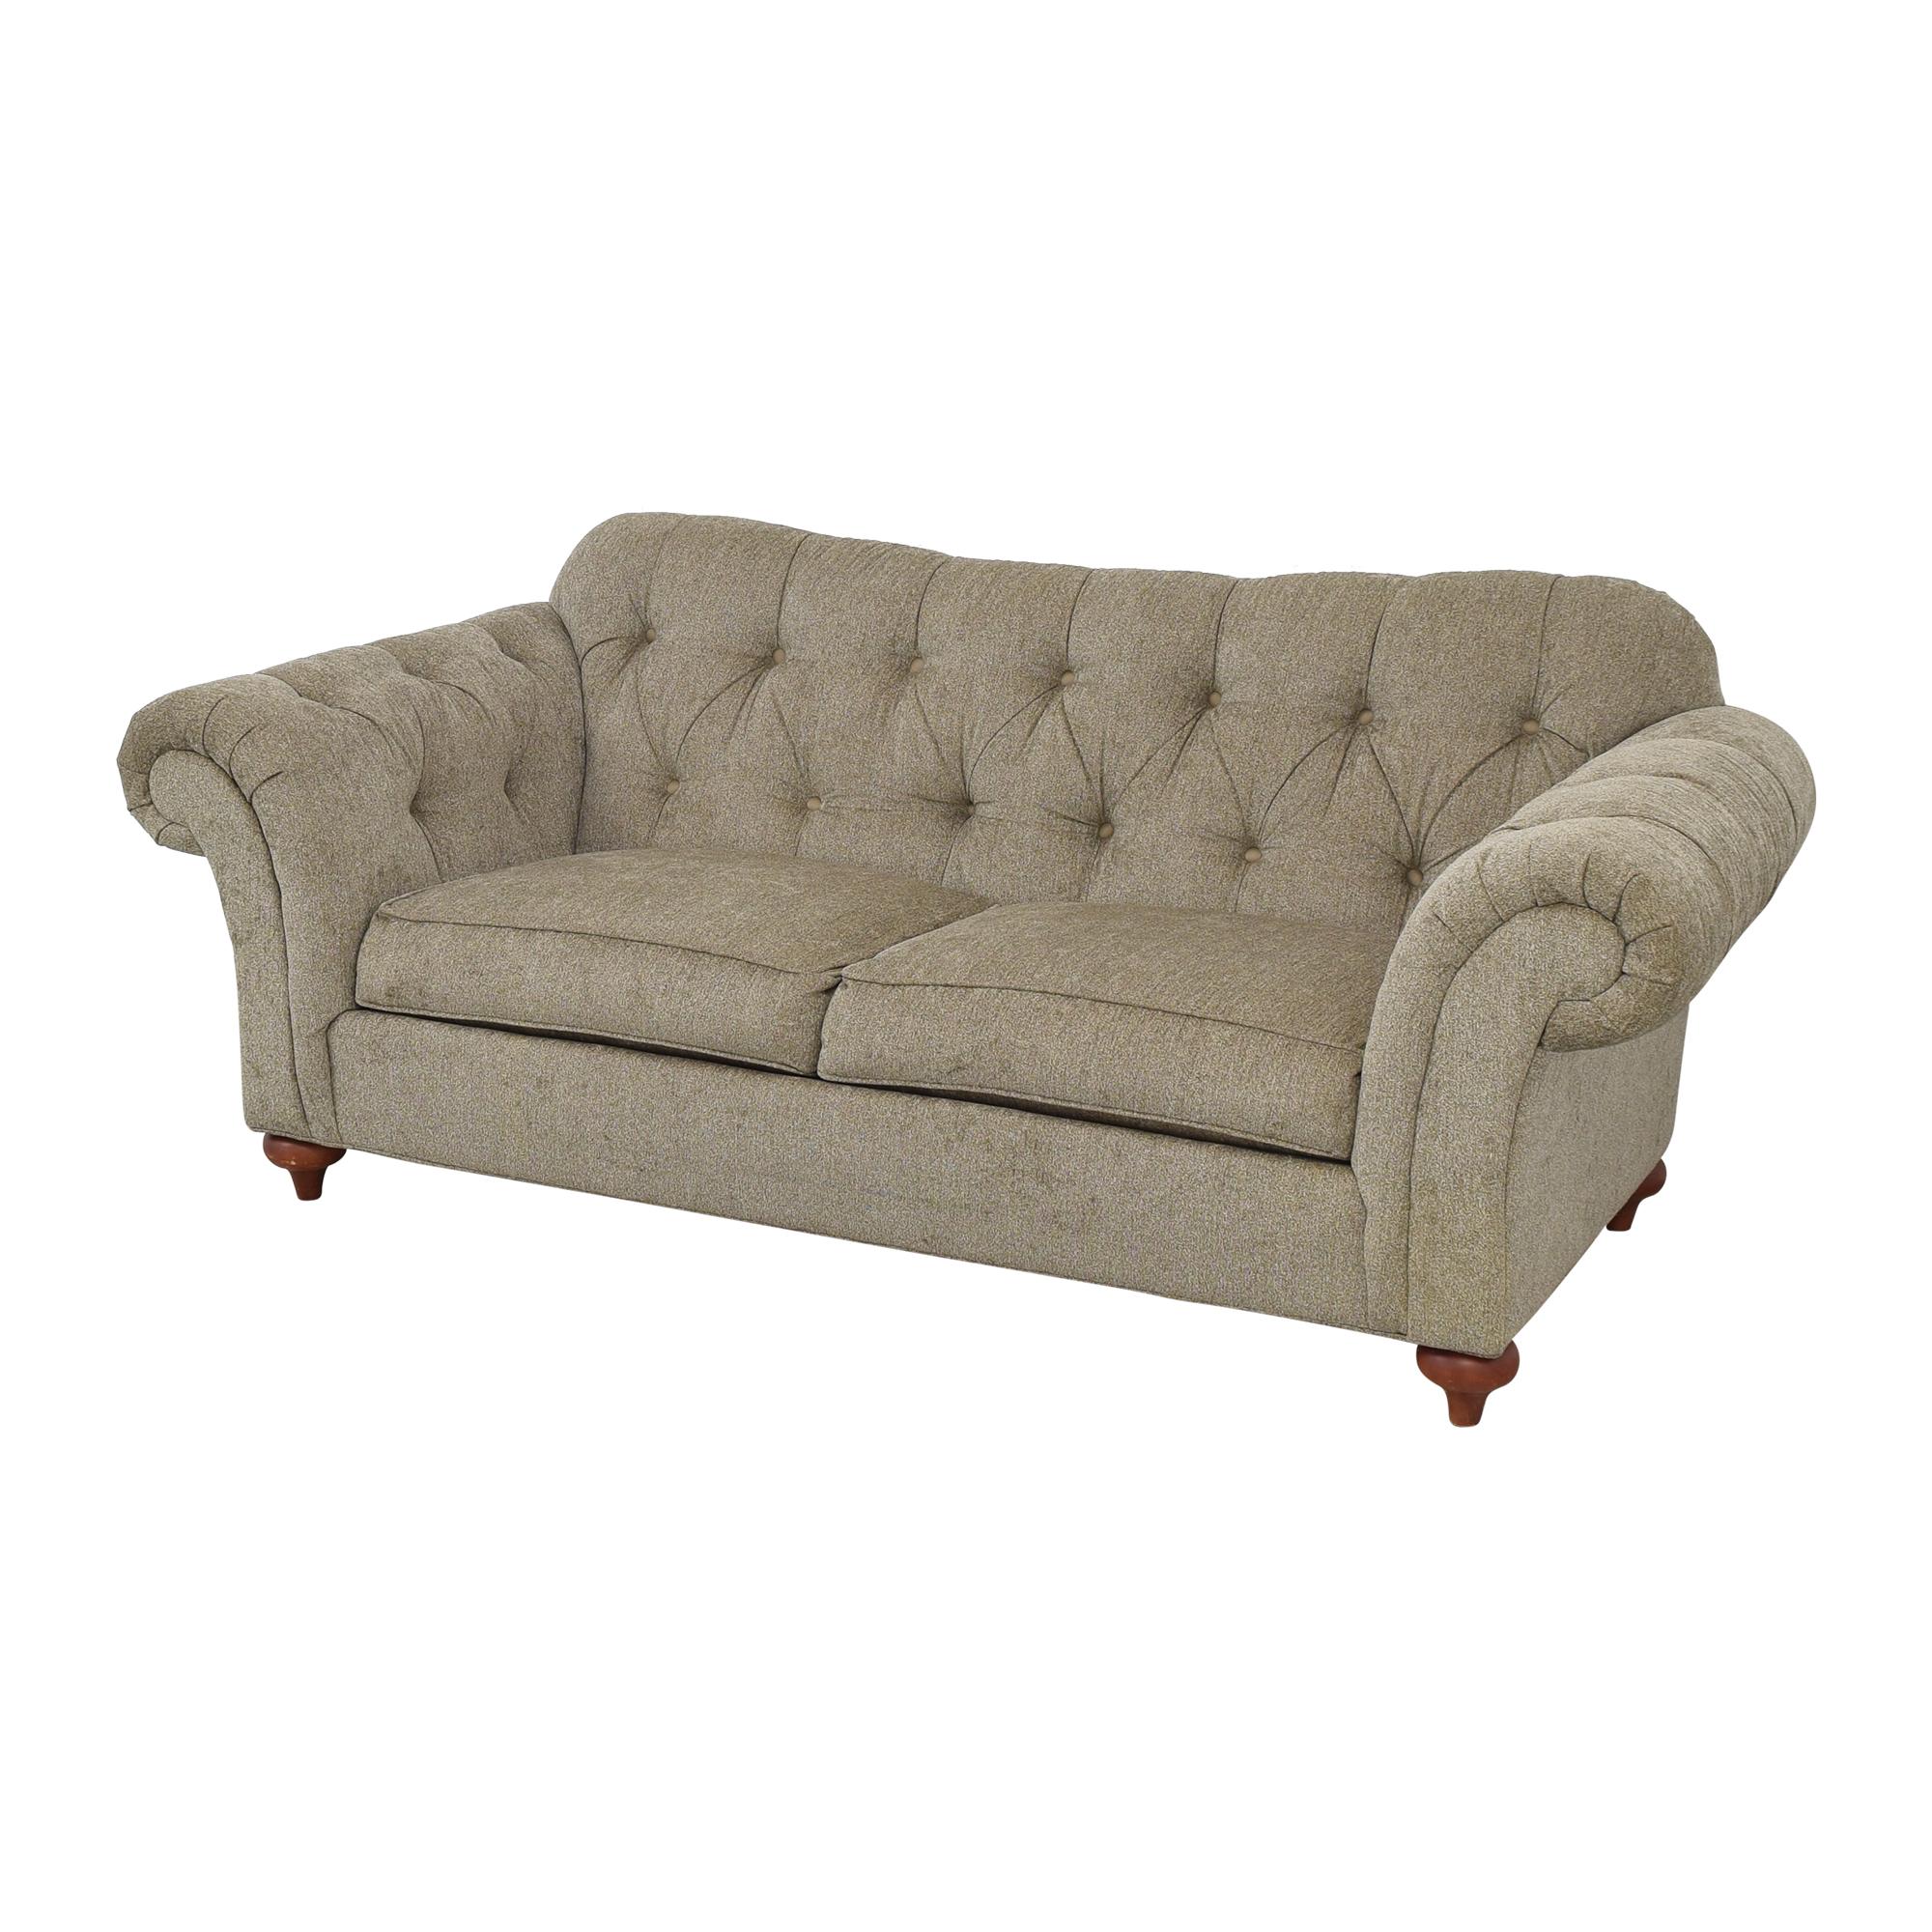 Ethan Allen Ethan Allen Two Cushion Sofa discount